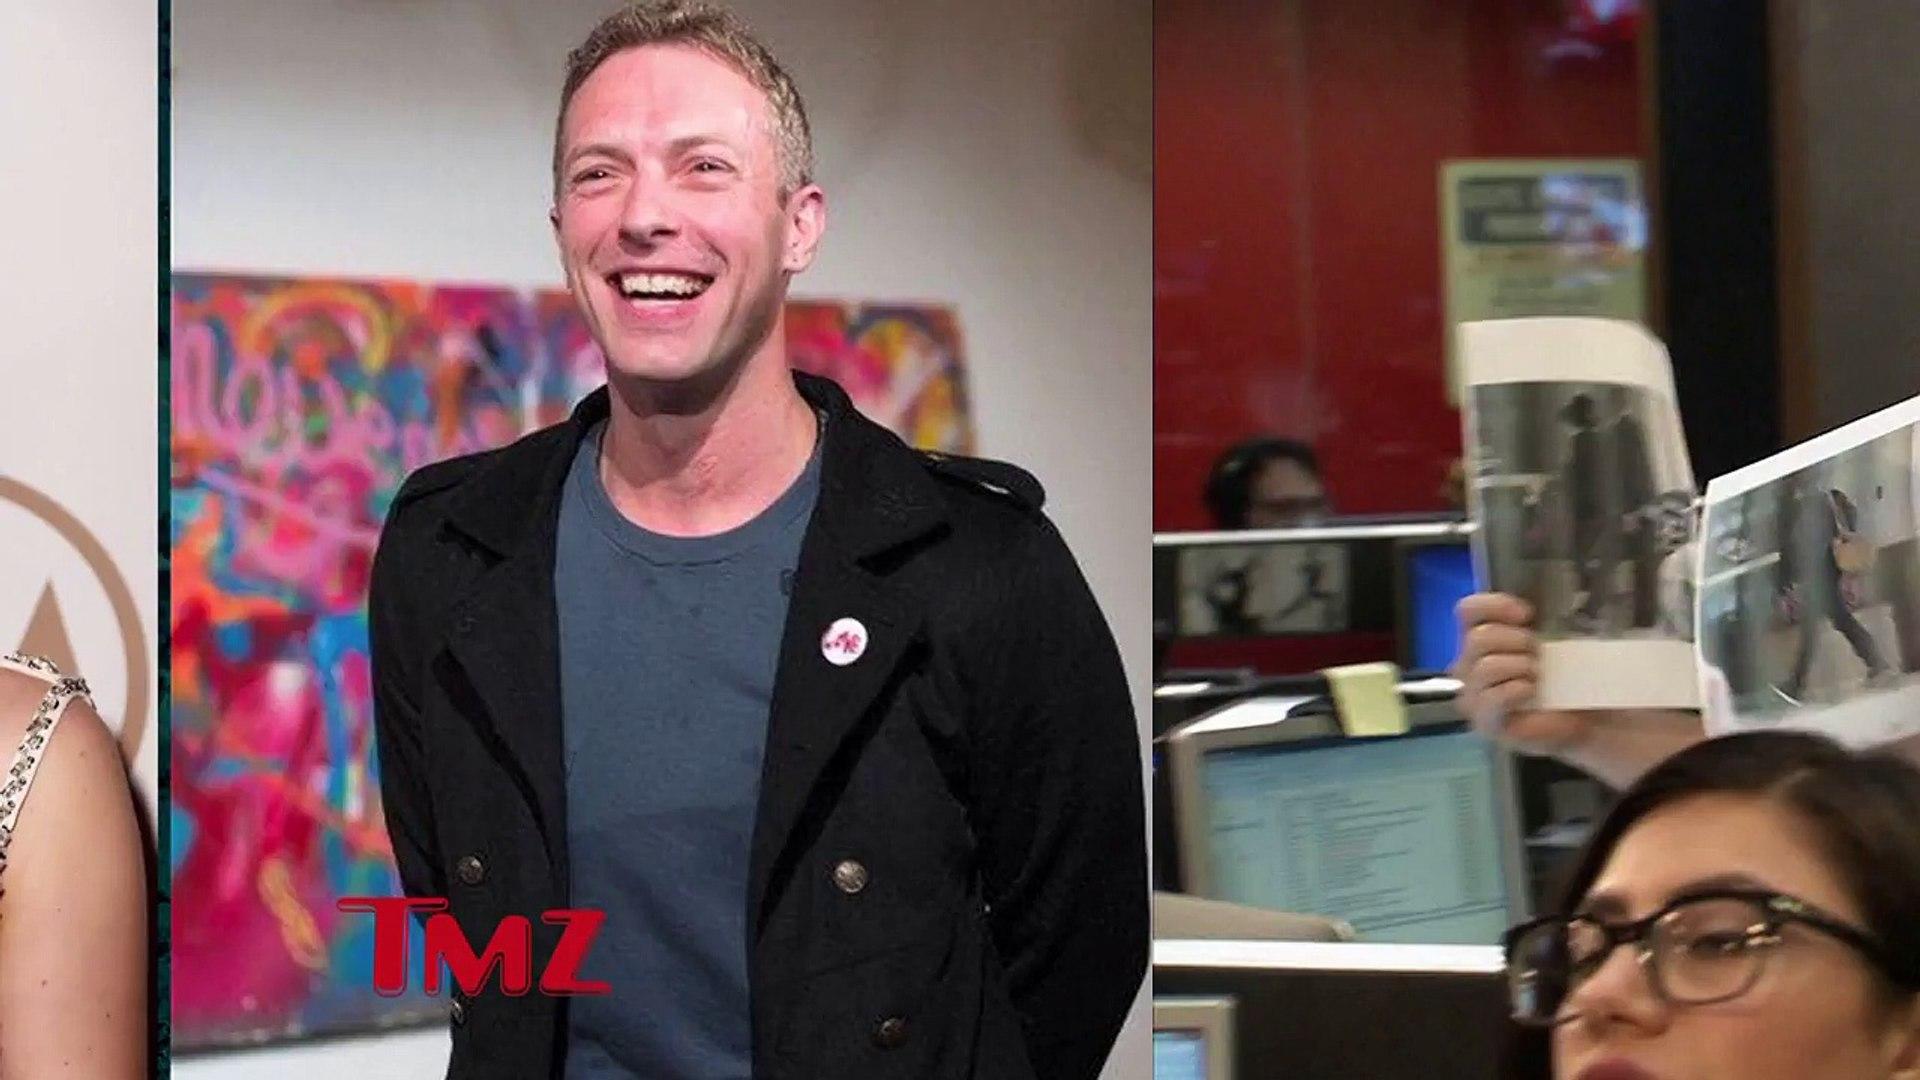 Chris Martin and Jennifer Lawrence together?!!